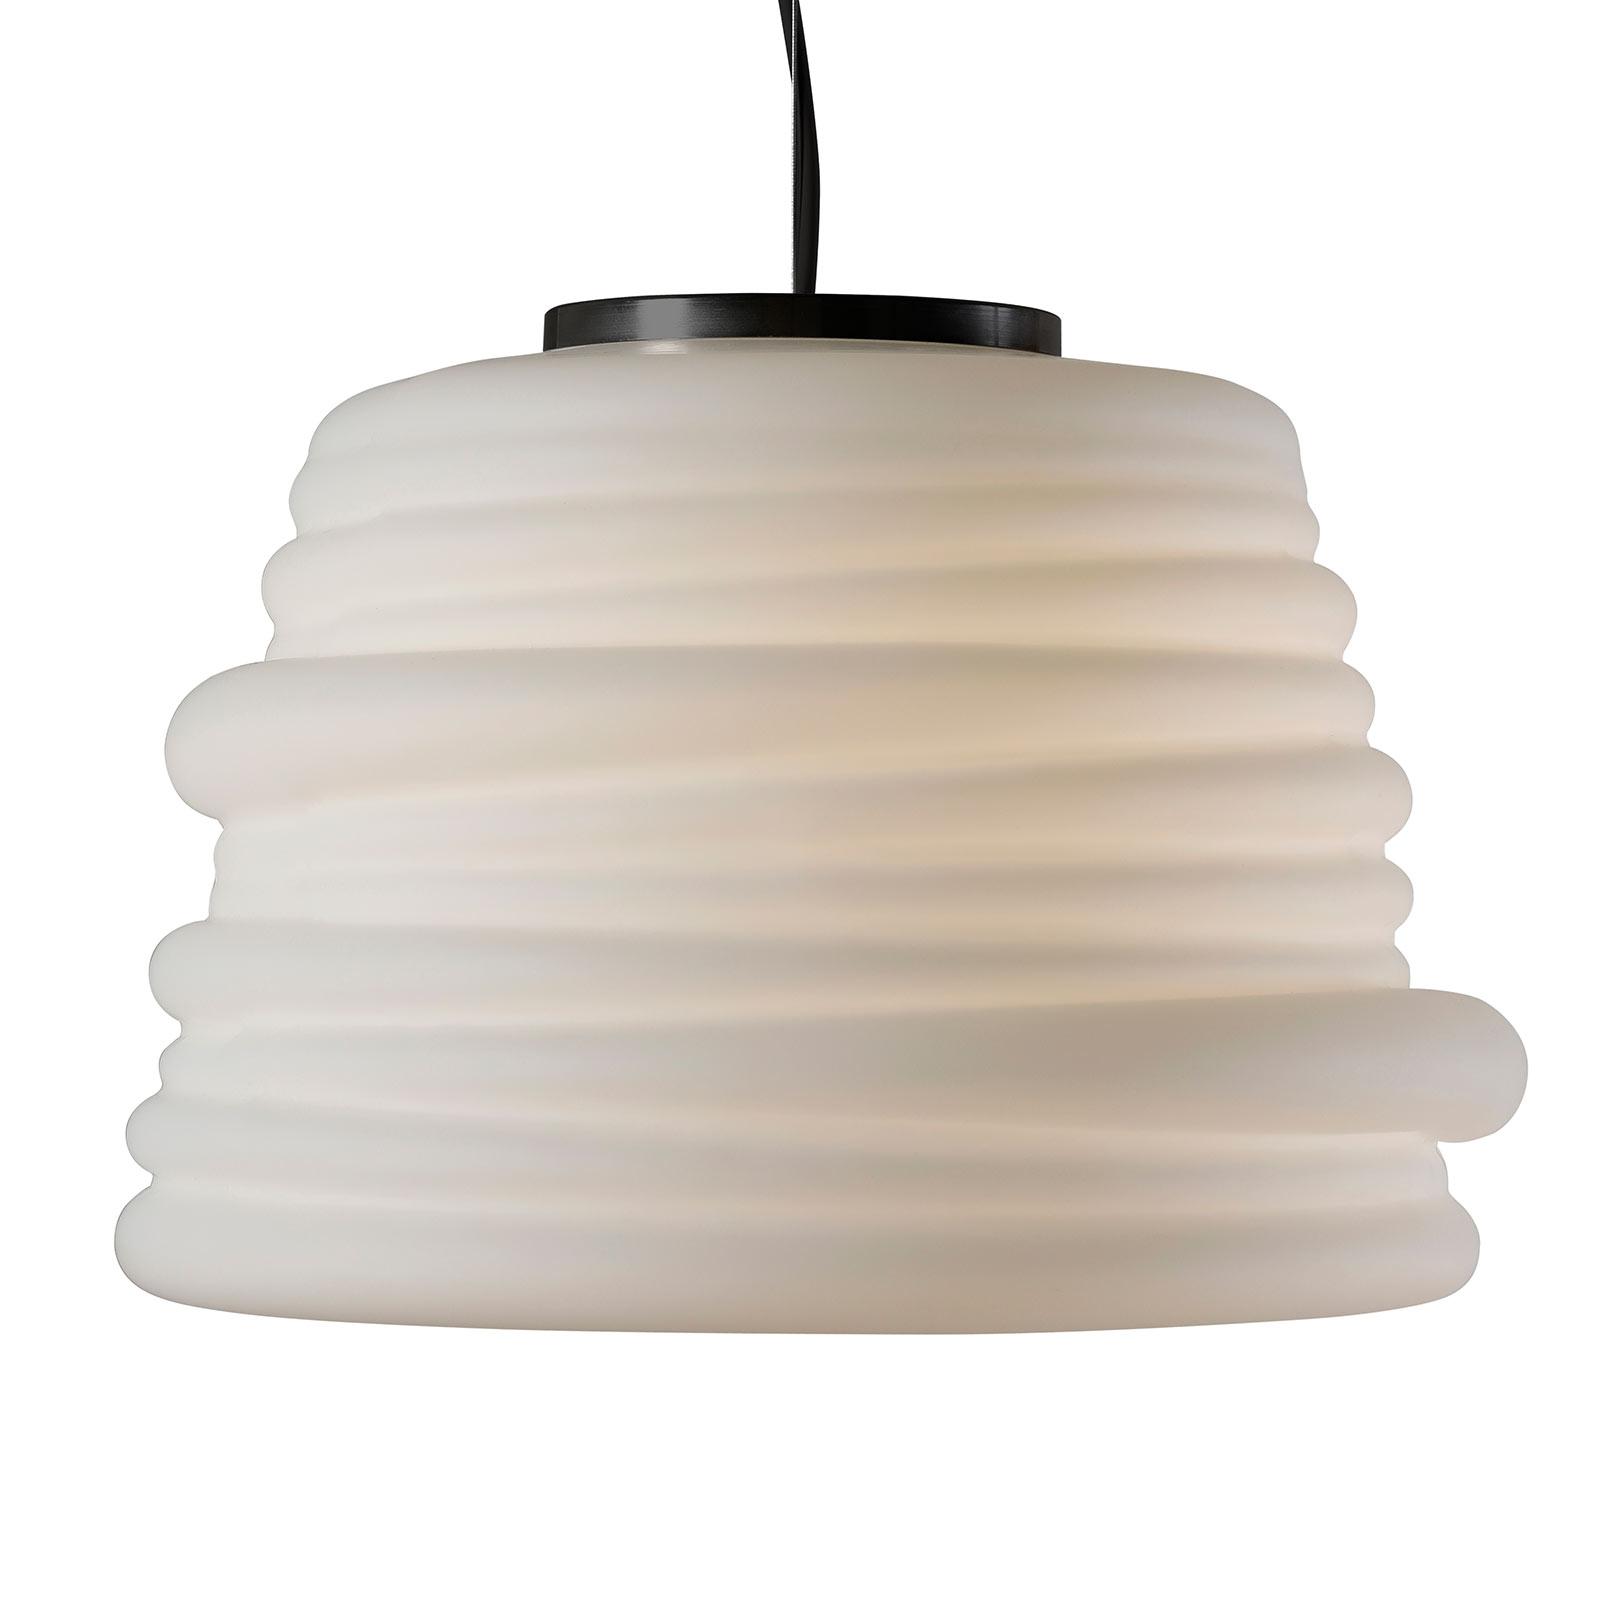 Karman Bibendum lampa wisząca LED, Ø 35 cm, biała